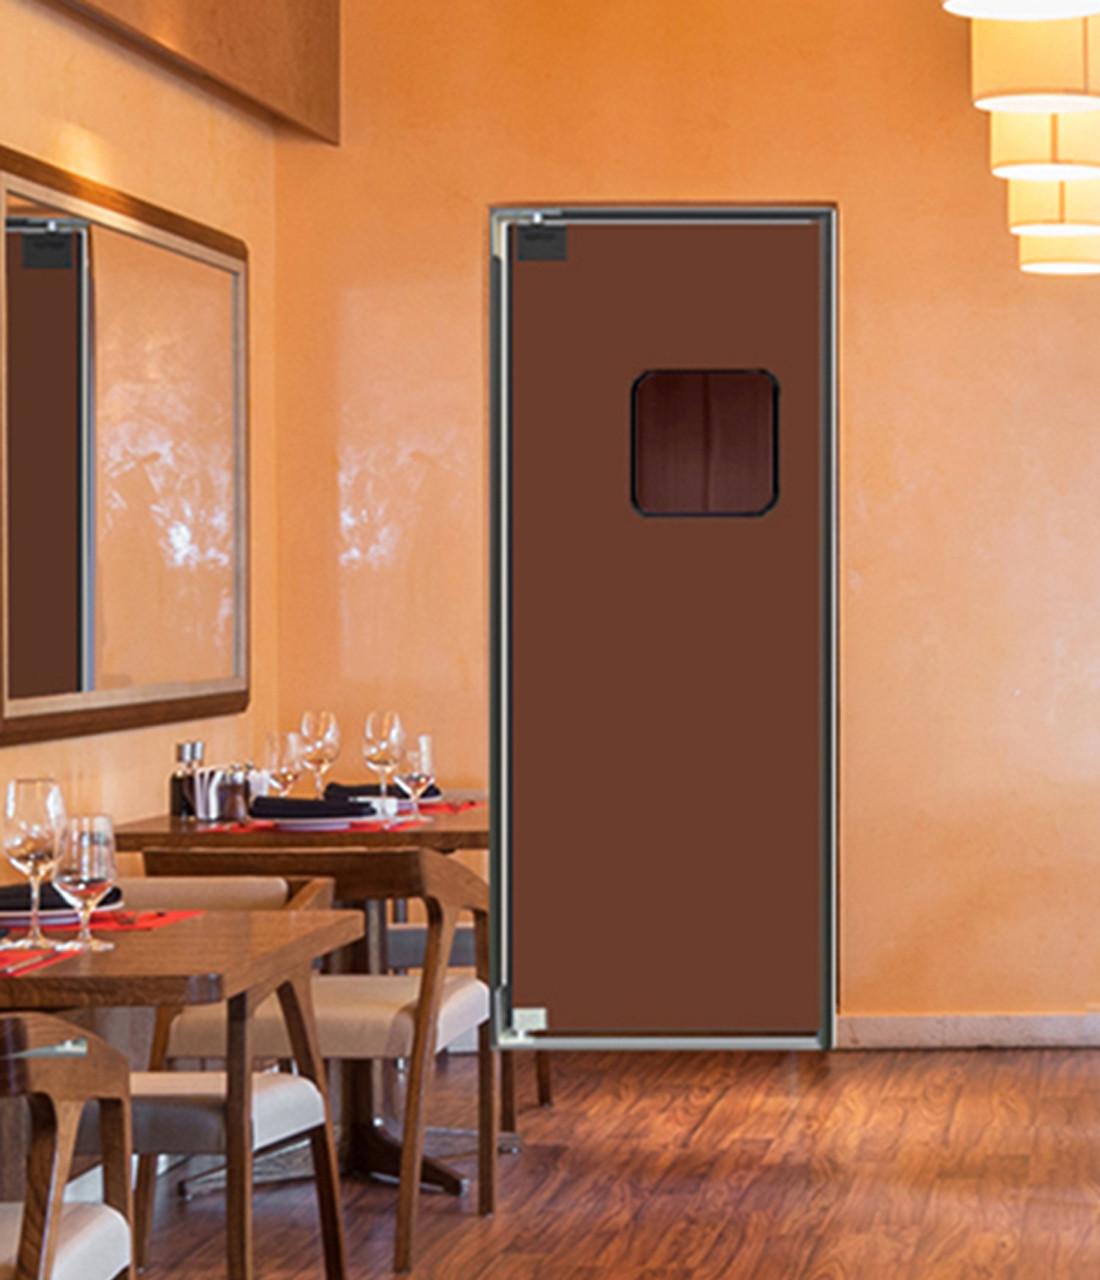 Wood Free Swing Doors Engineered With No Wood Or Organic